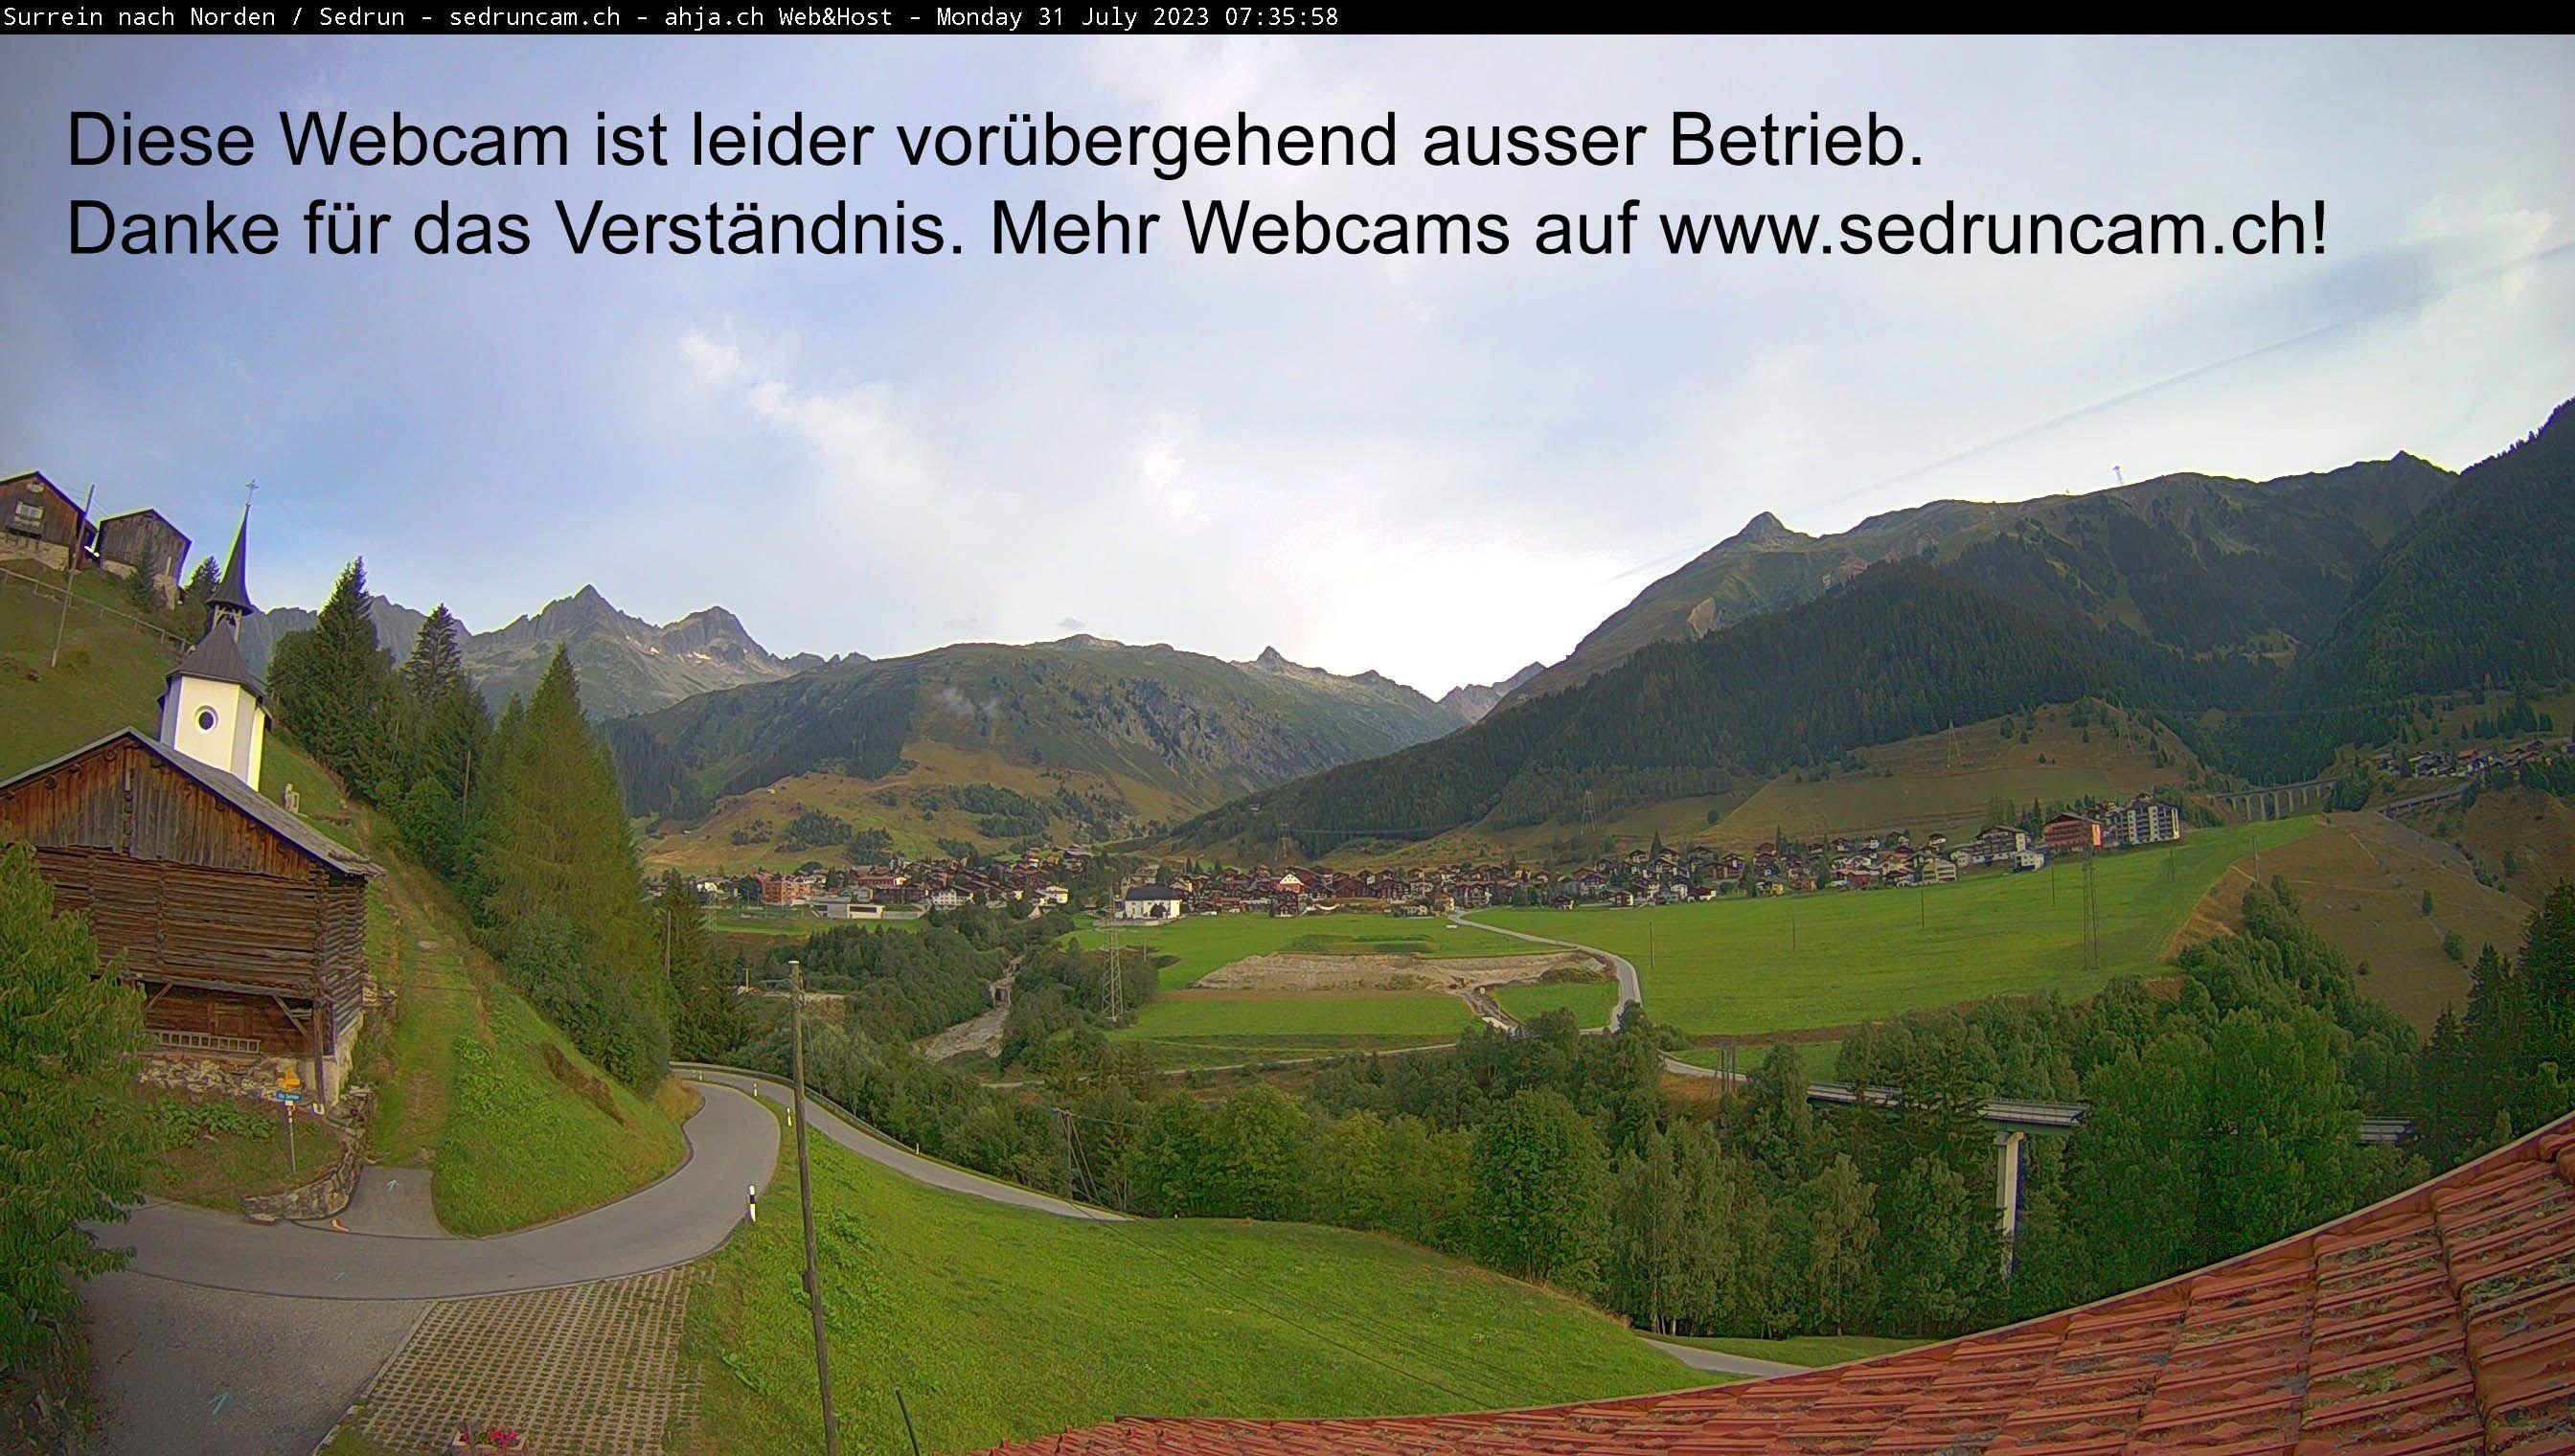 Sedrun: Via Surrein - Tujetsch - Via Gionda - Caschlè - Culmatsch - Witenalpstock